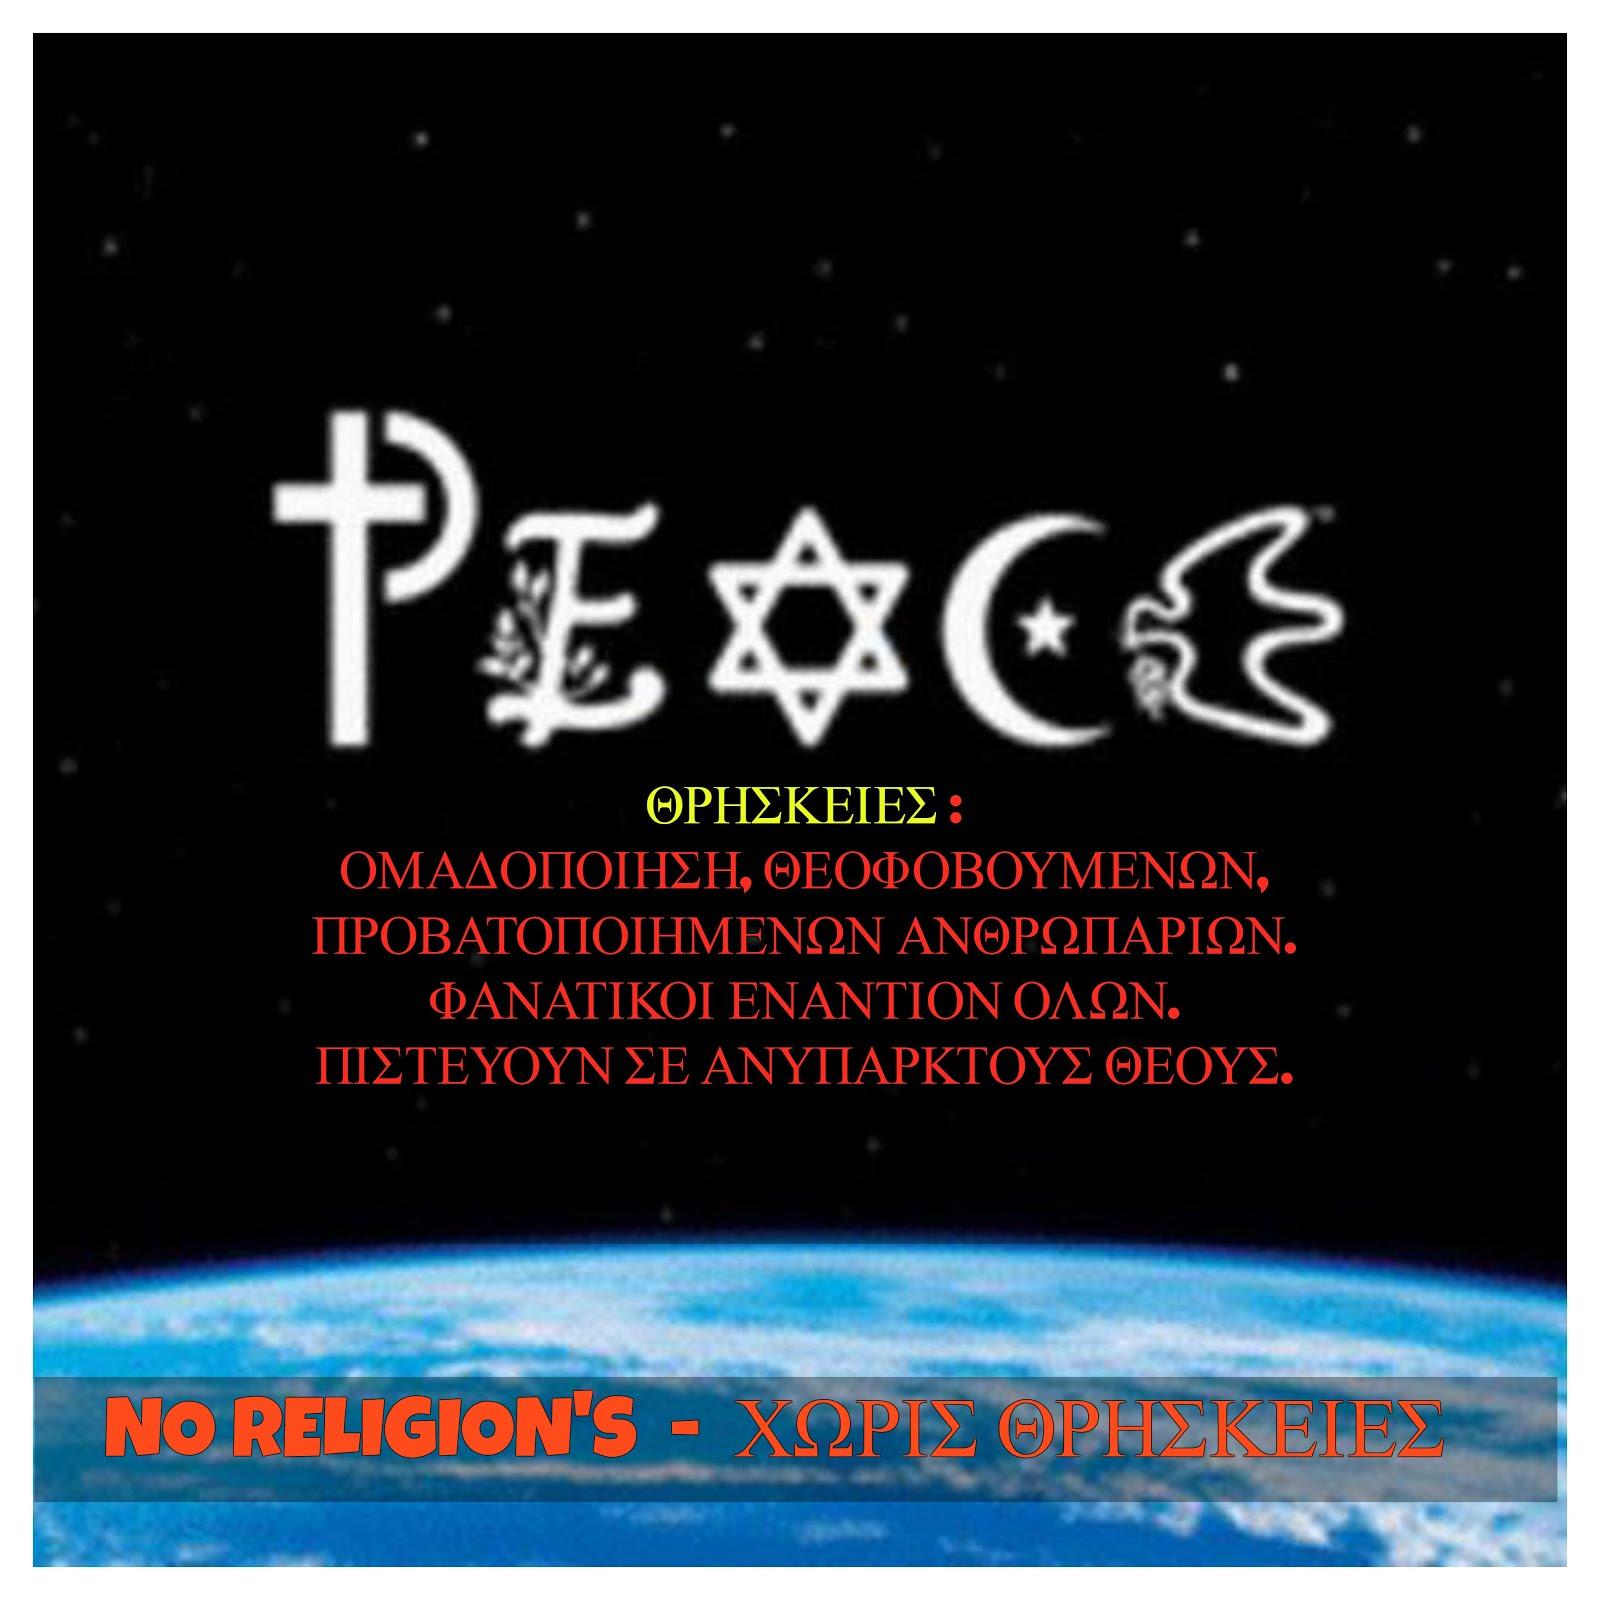 NO RELIGION'S - ΧΩΡΙΣ ΘΡΗΣΚΕΙΕΣ